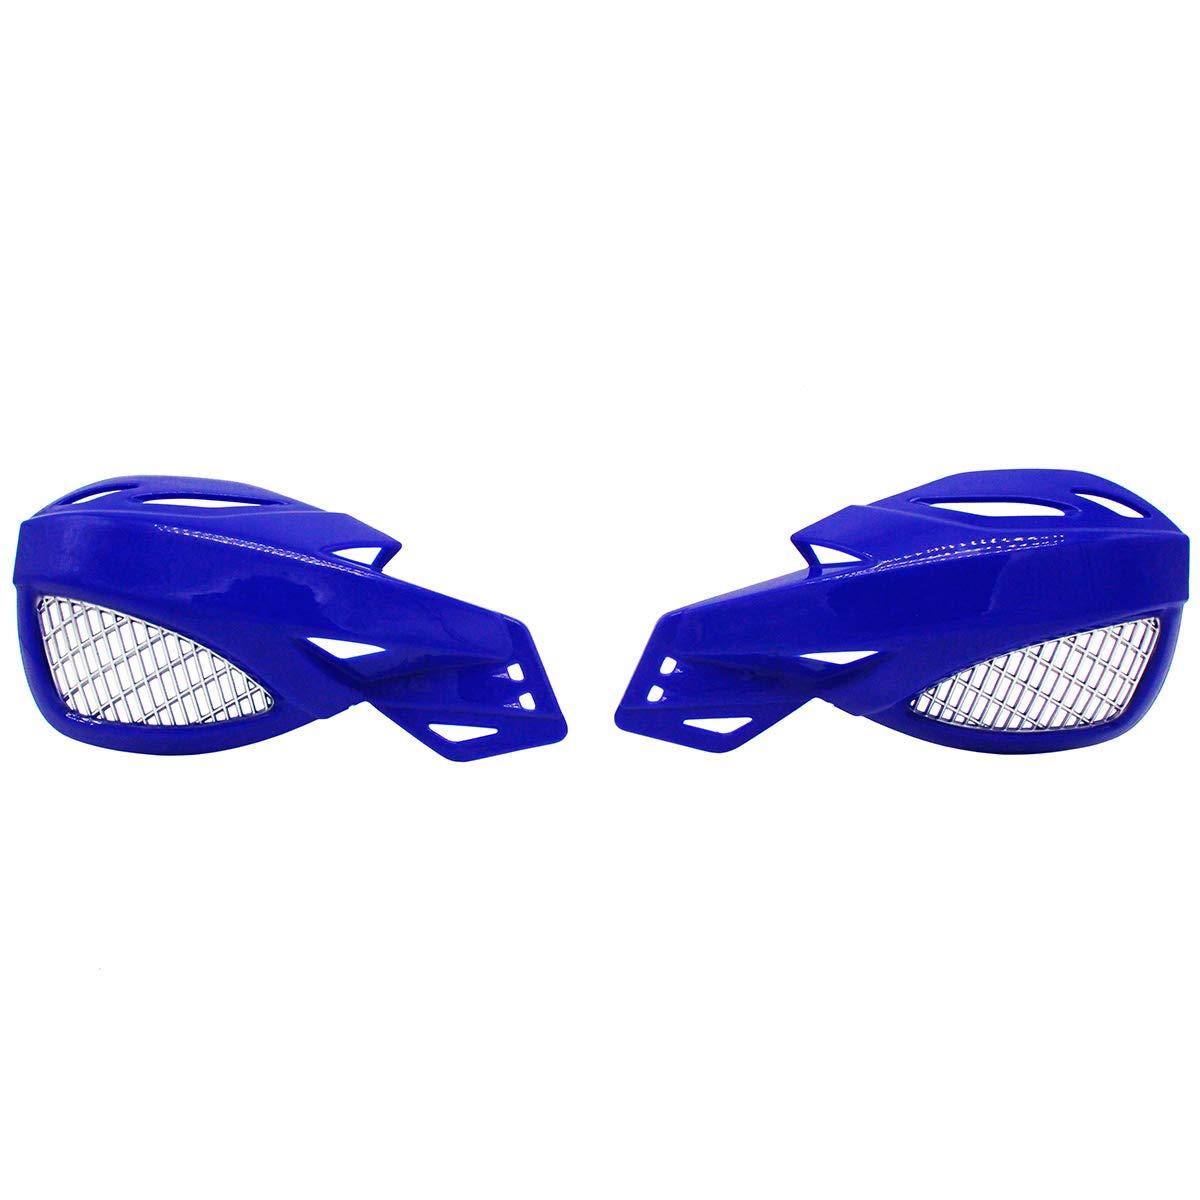 Lozom 7//8 Motorcycle Handguards Handlebar Hand Guards Brush Bar Protector For Motocross Supermoto Racing Dirt Bike ATV Blue